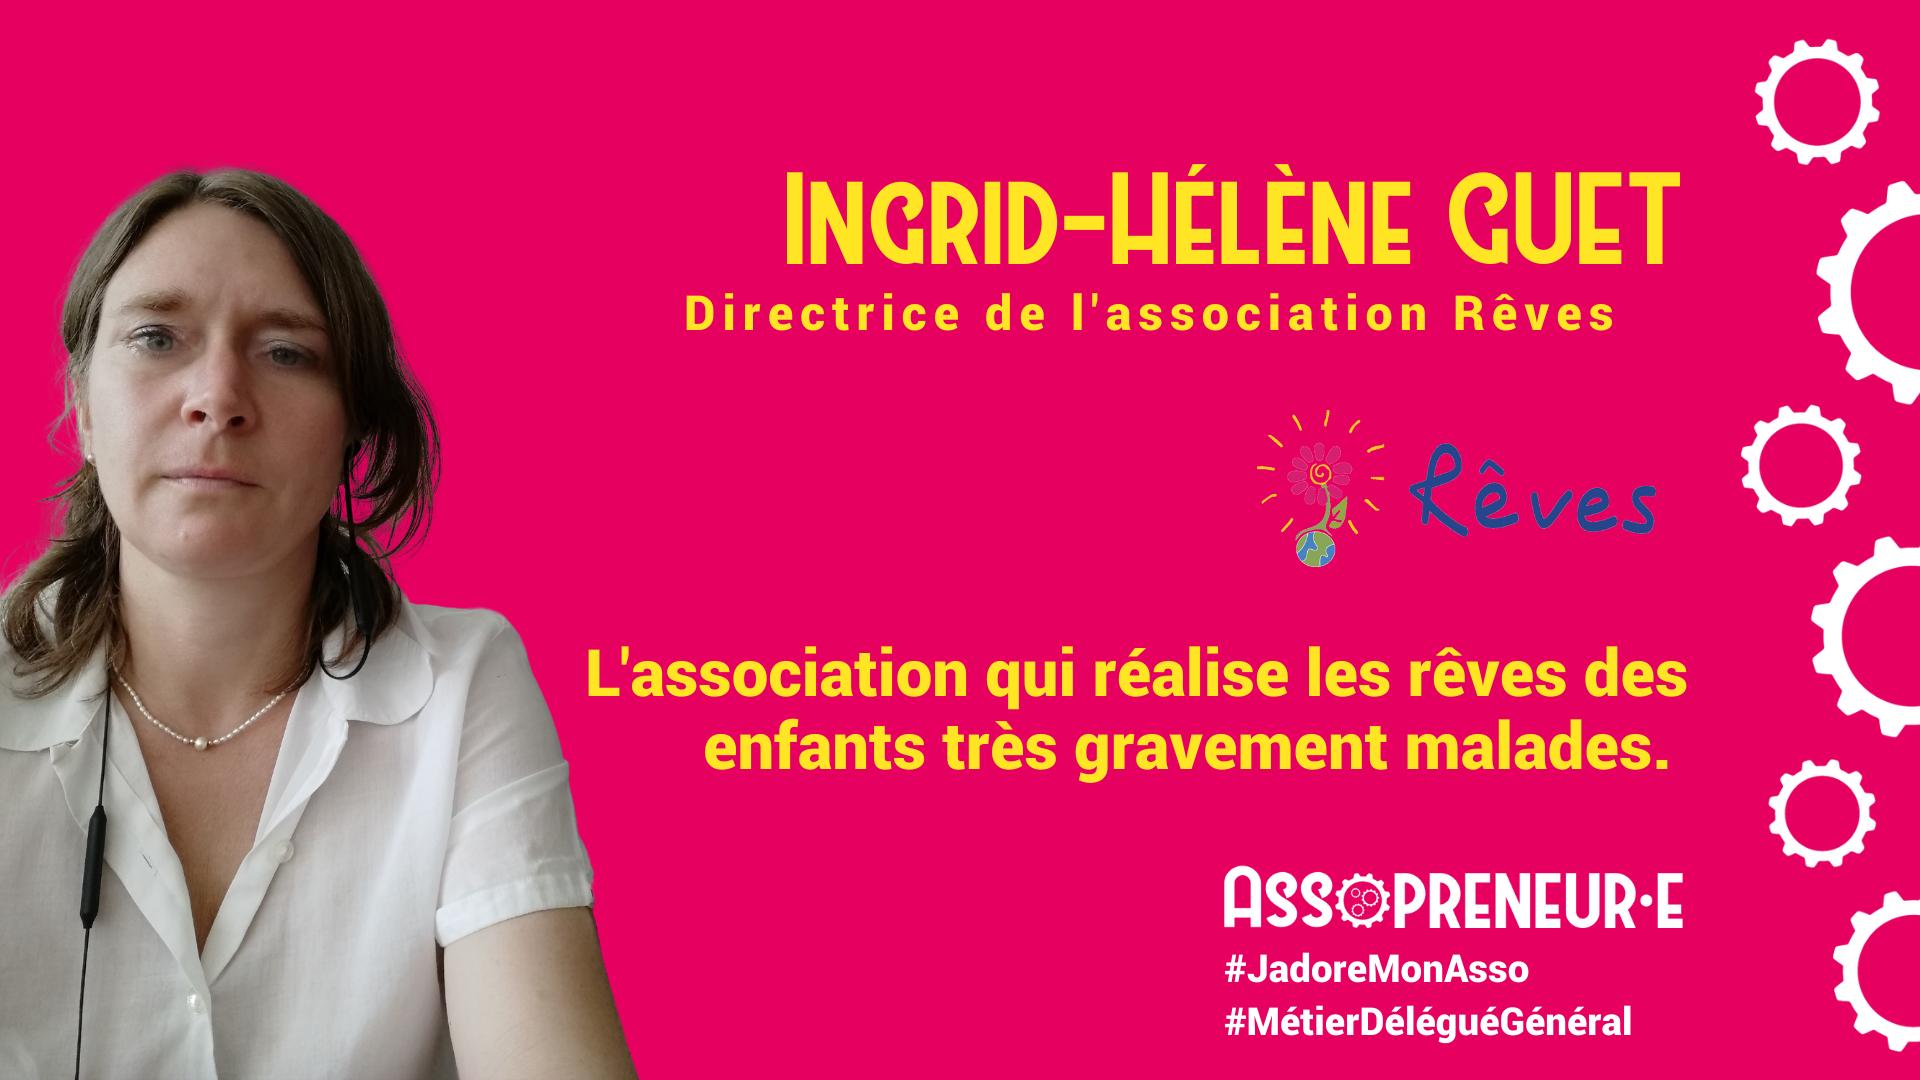 Ingrid Helene Guet membre programme Assopreneur